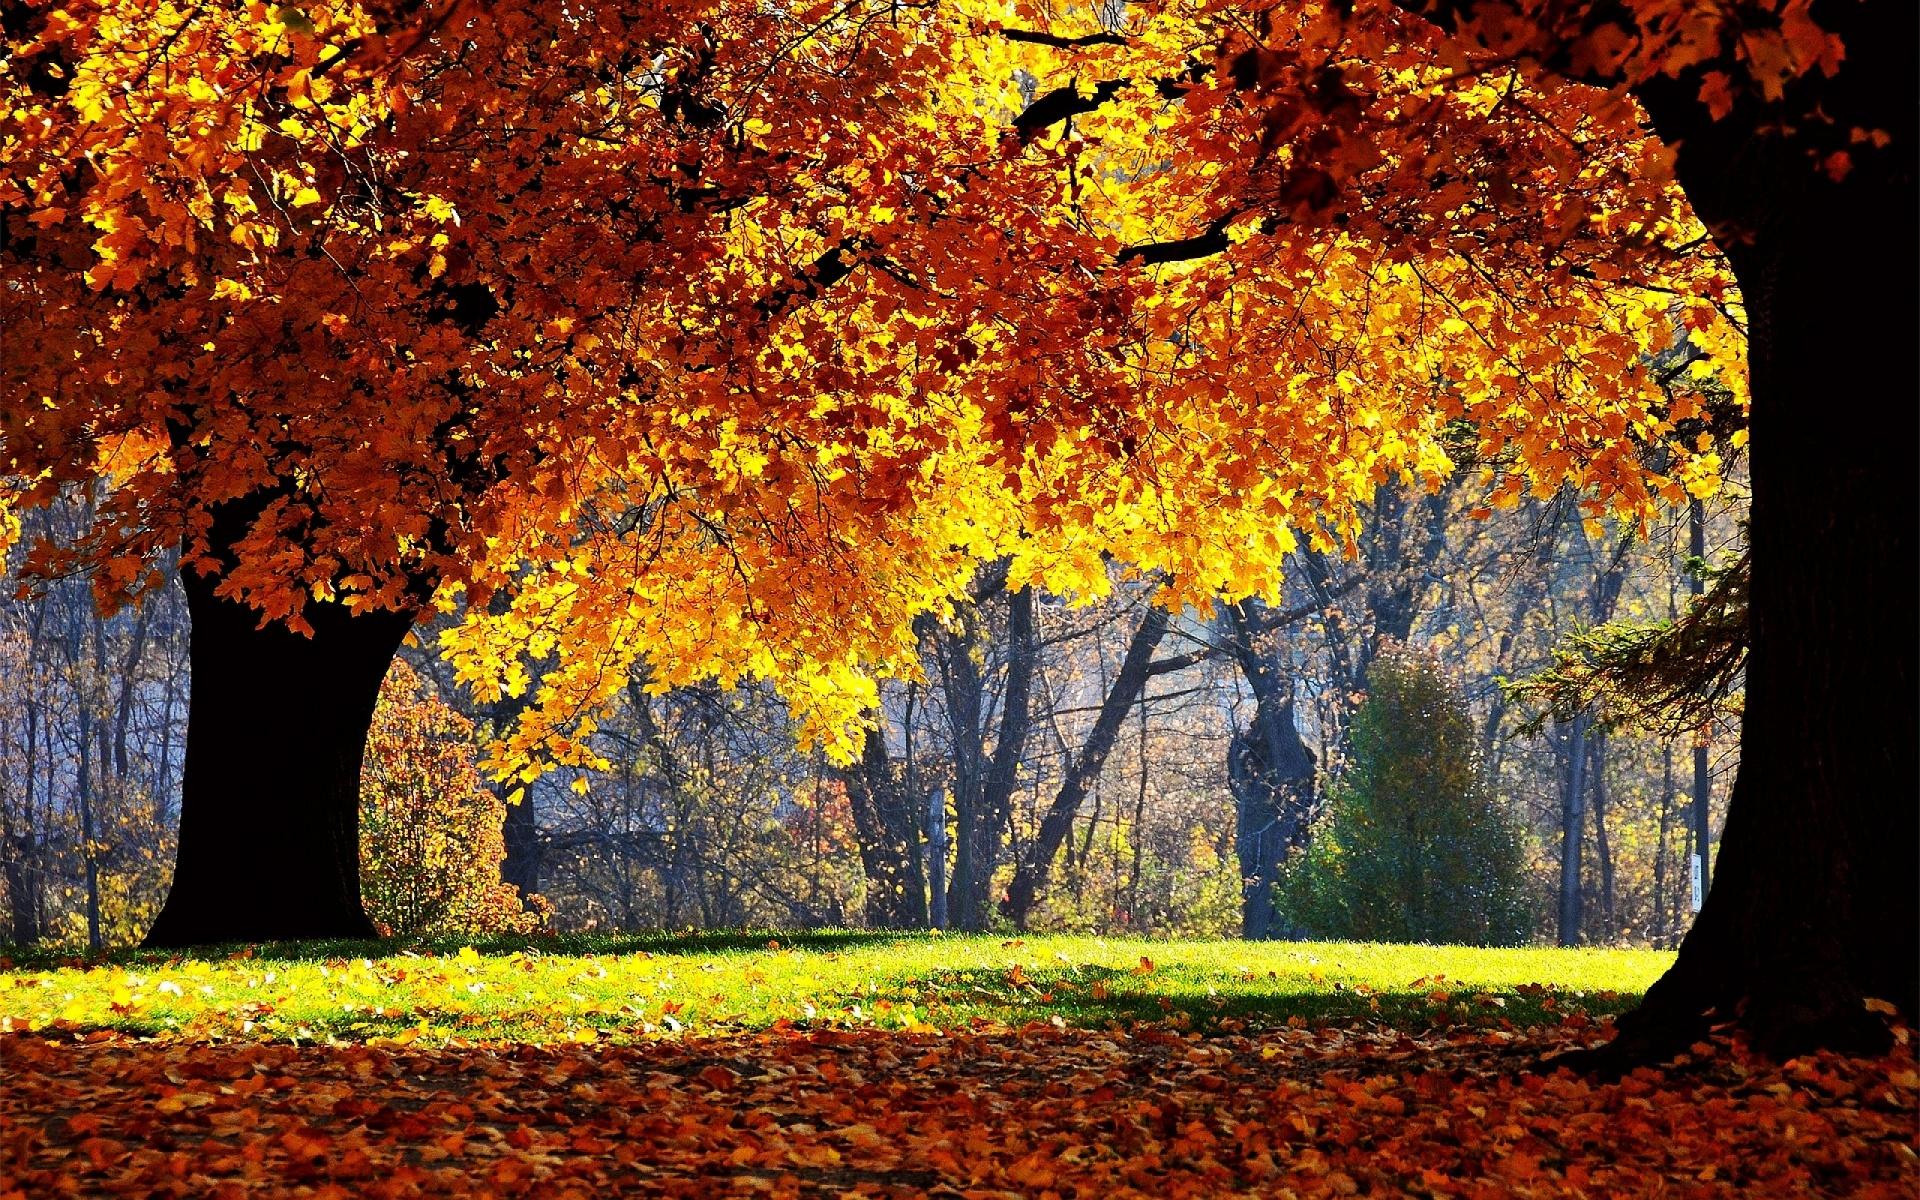 Fall Leaves Desktop Wallpaper Free Autumn Forest Wallpaper For Desktop Pixelstalk Net